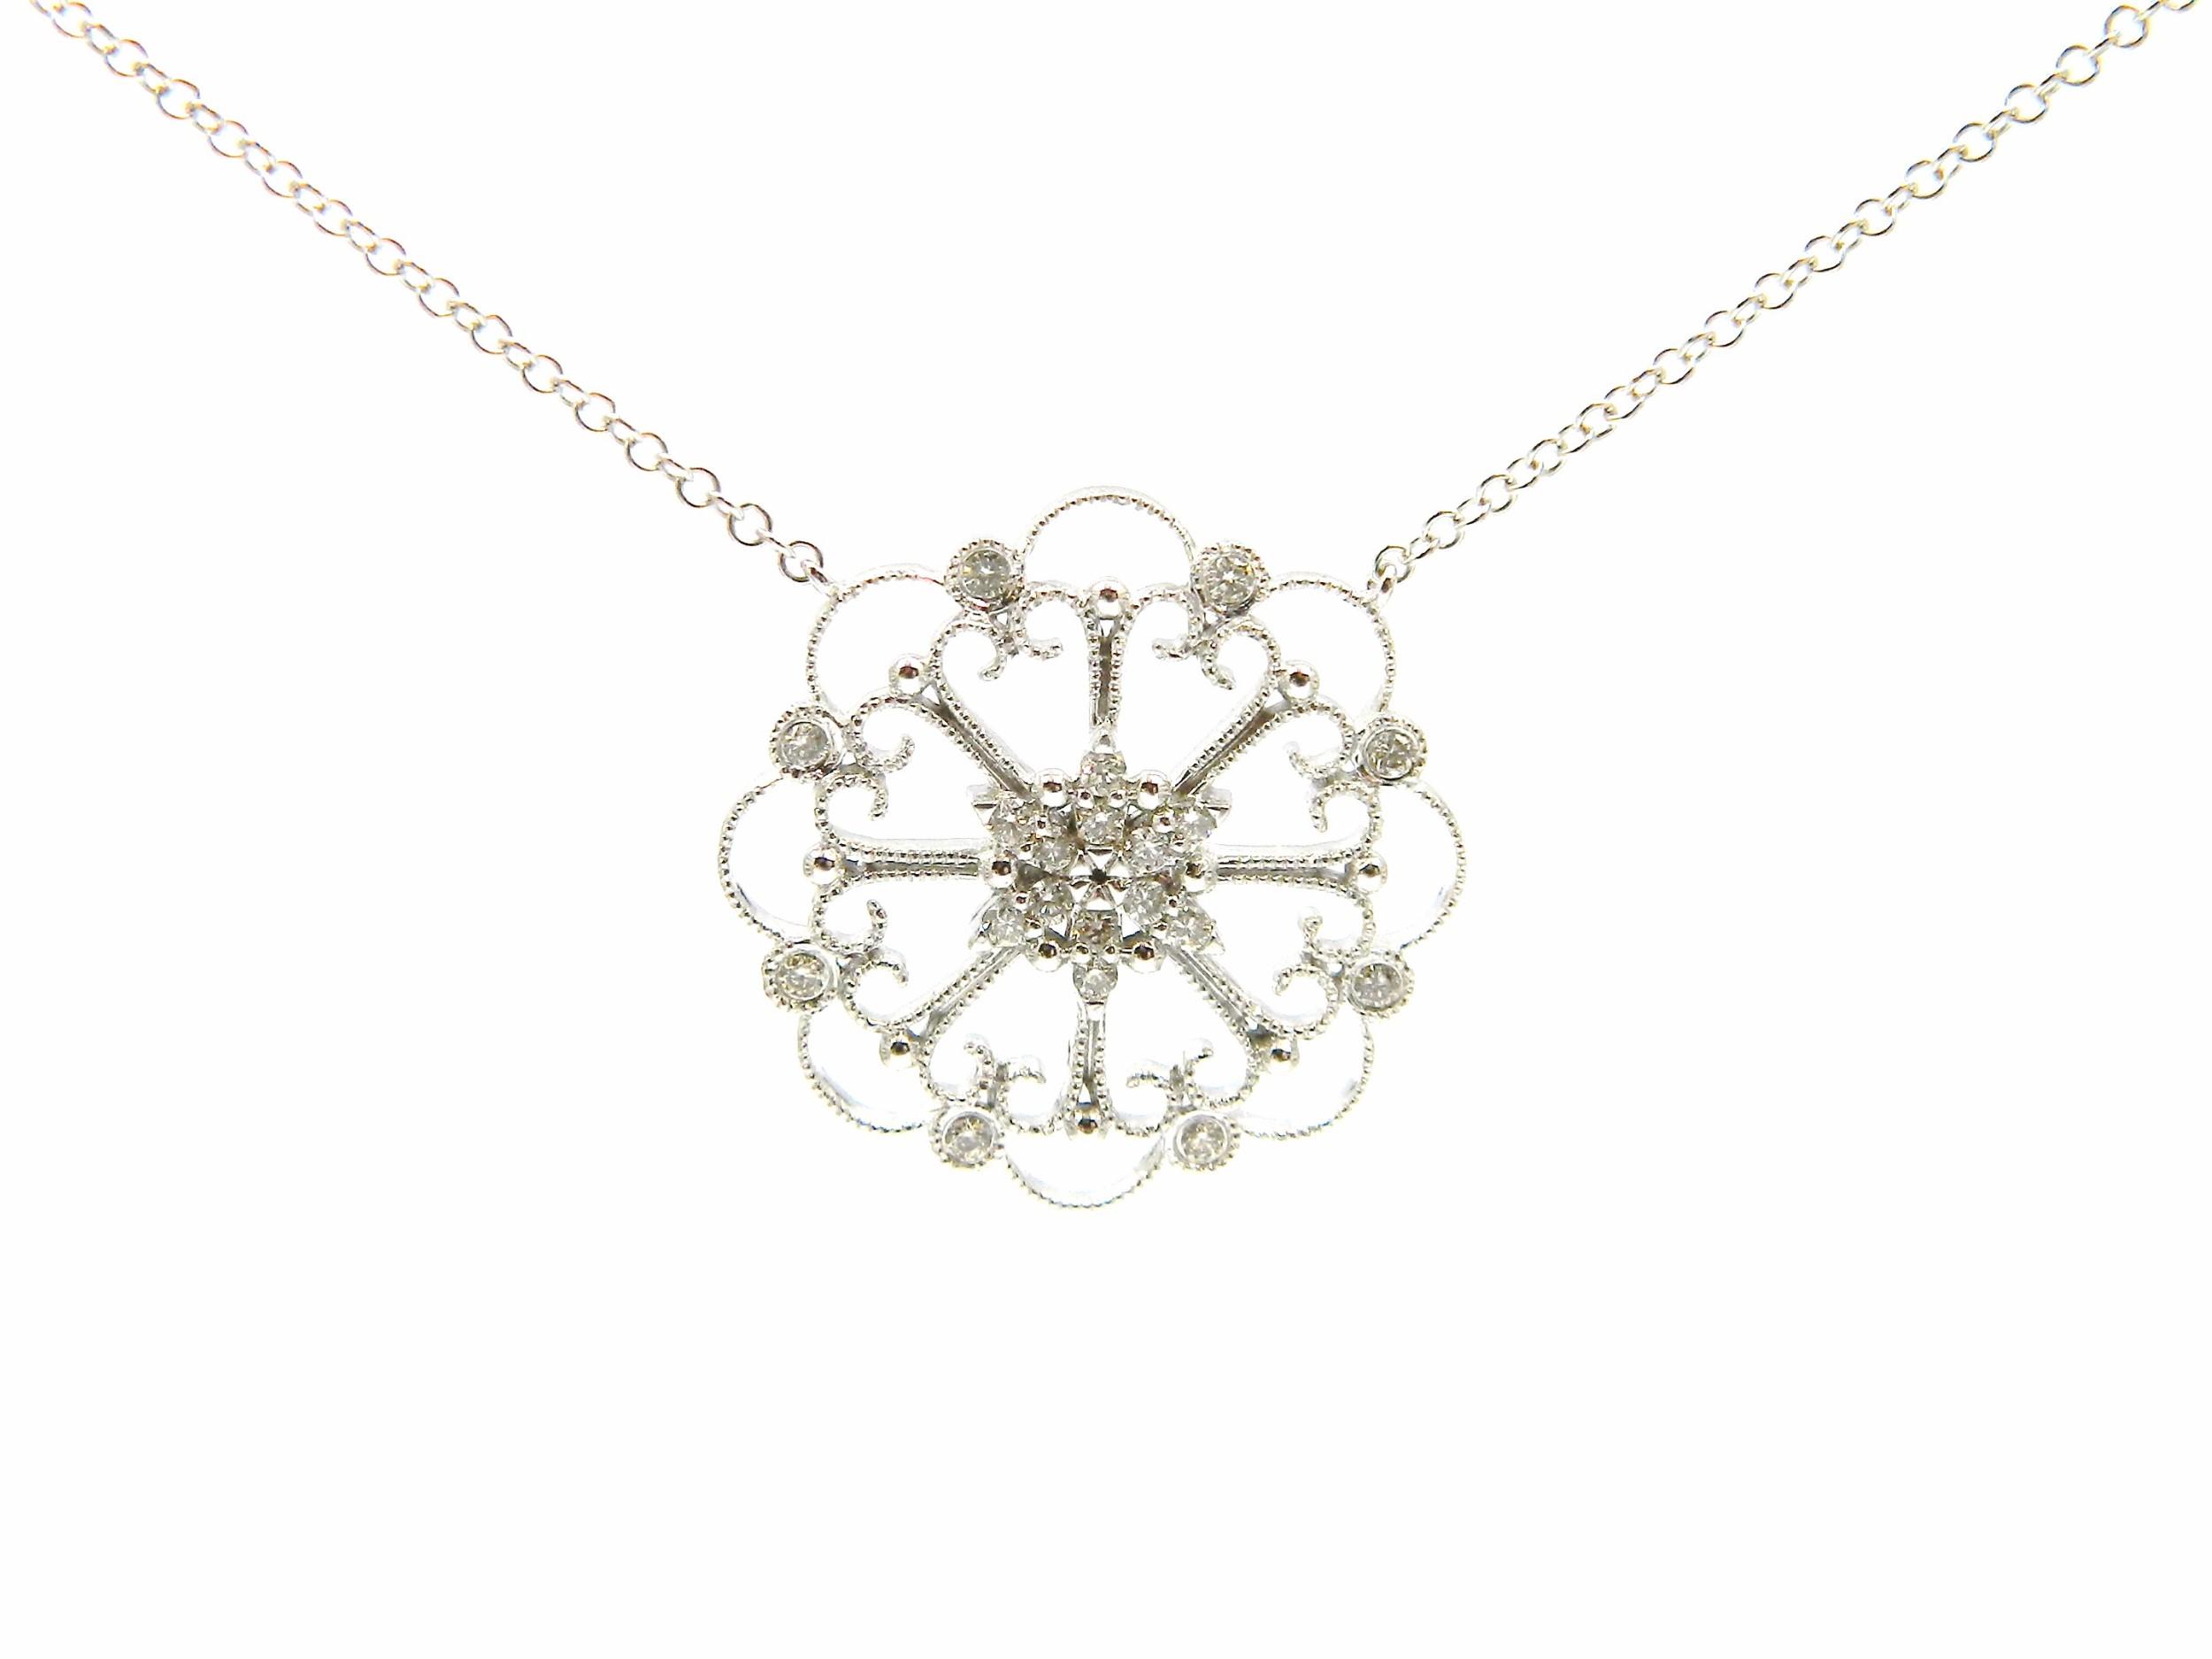 White Gold Diamond Filigree Pendant Necklace